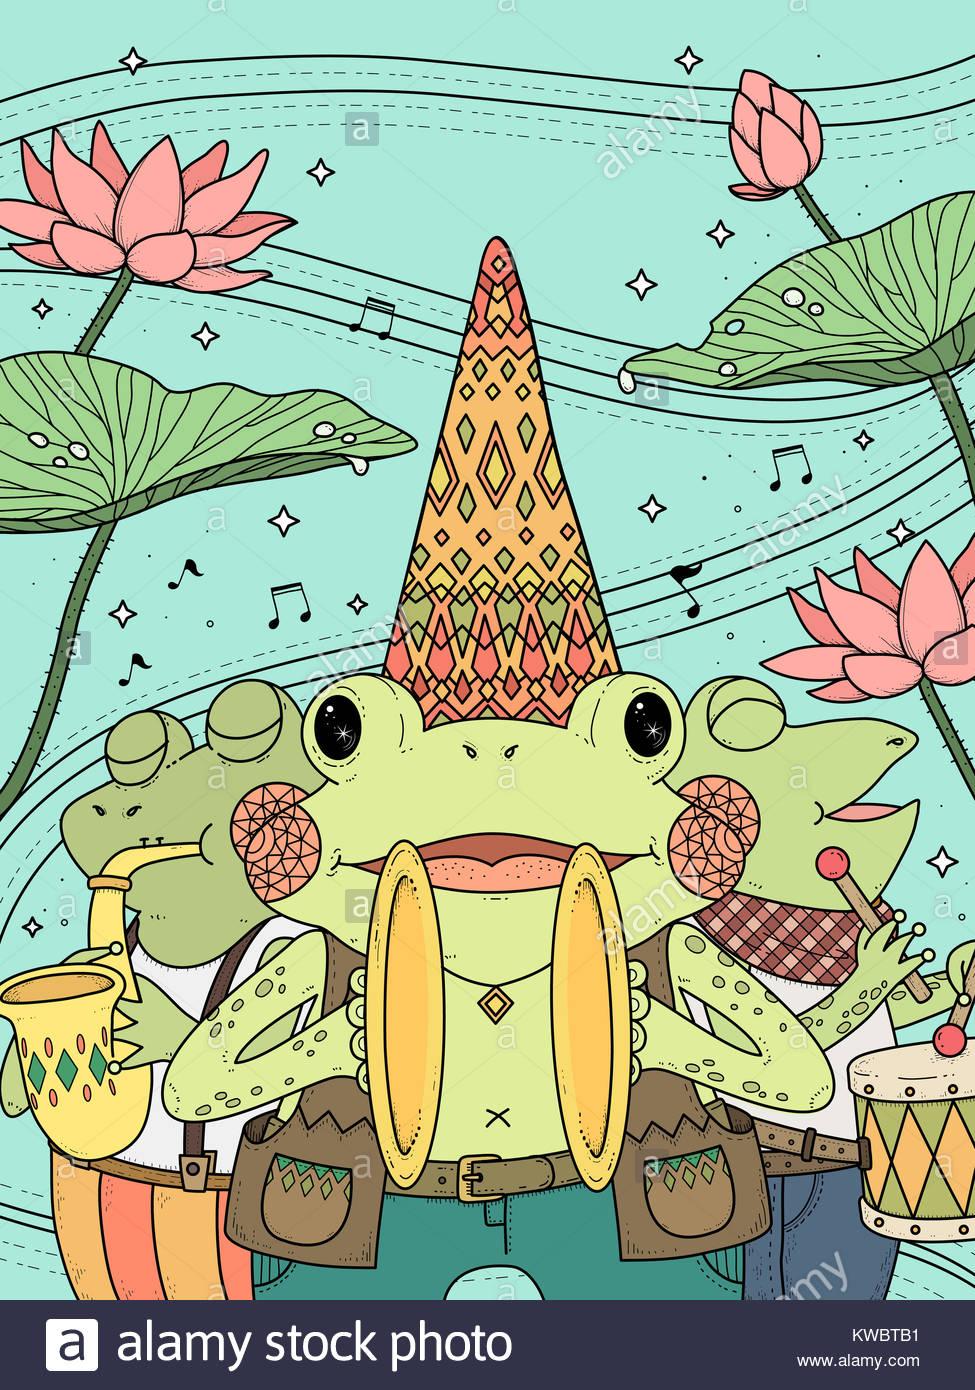 Cartoon Music Instruments Coloring Page Stockfotos & Cartoon Music ...